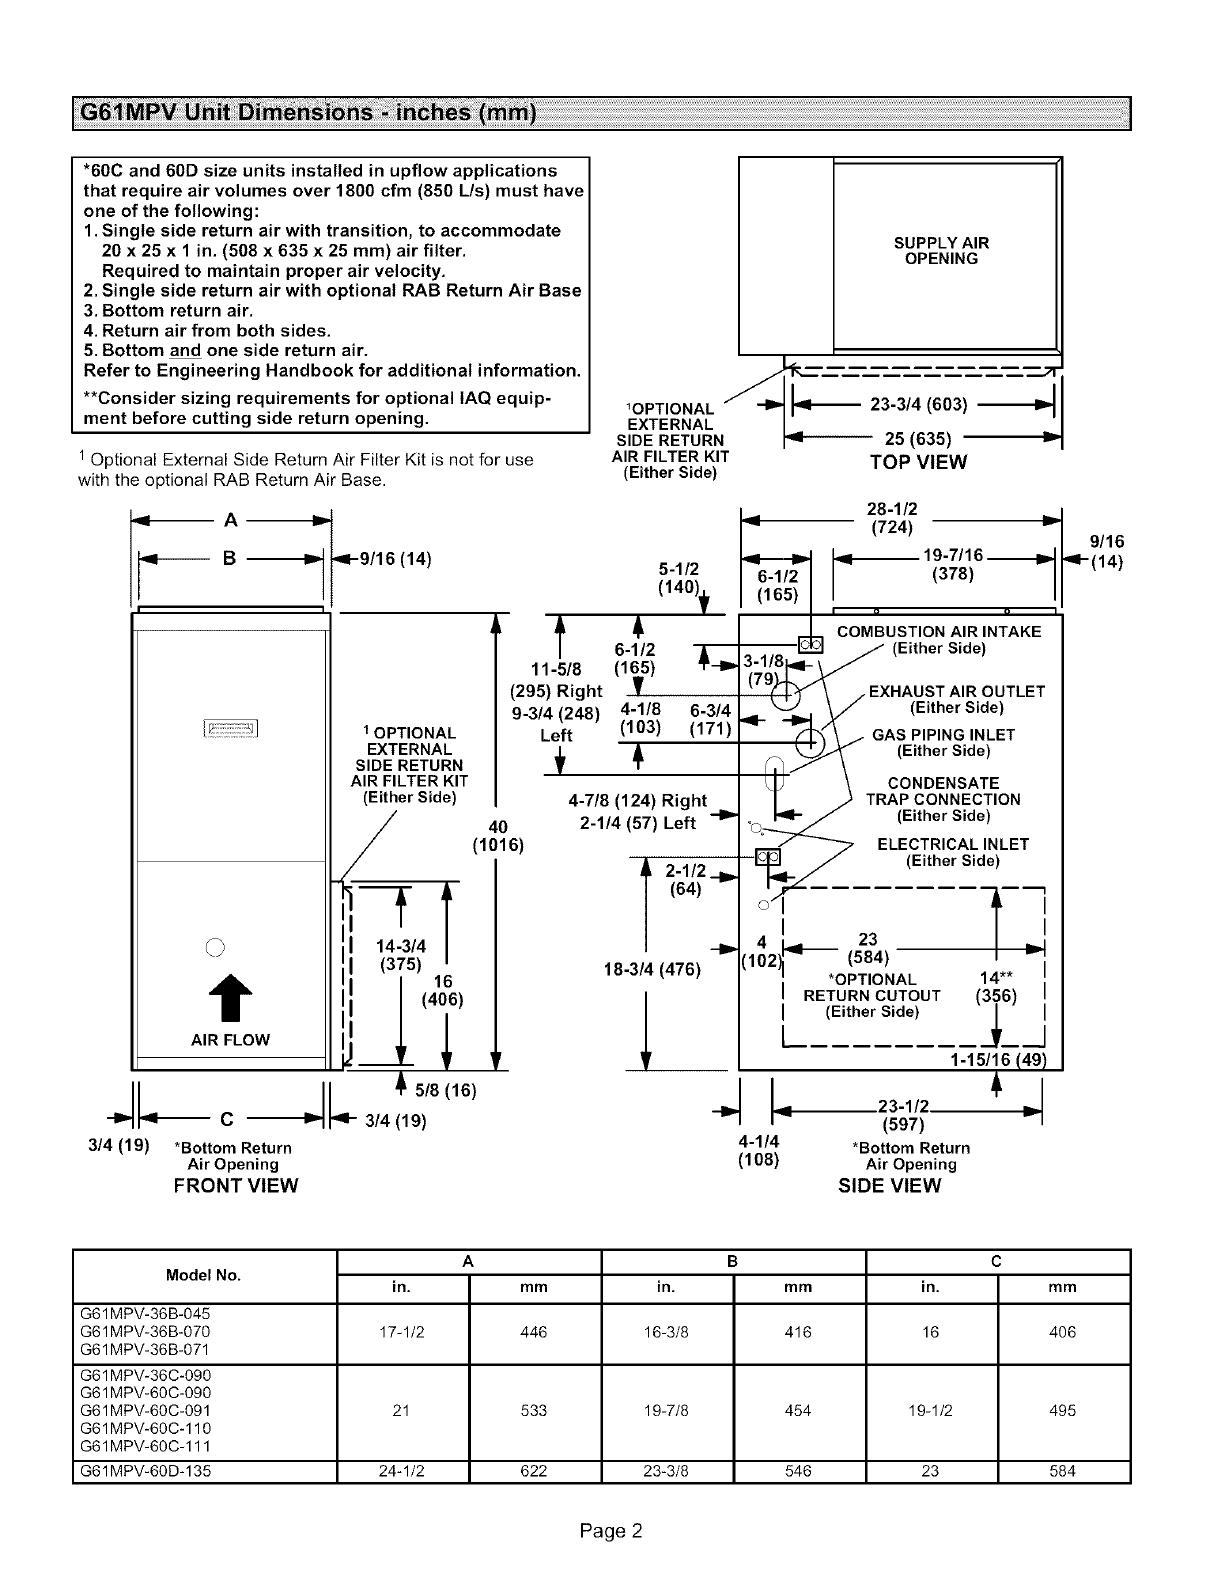 Lennox Pulse Wiring Diagram